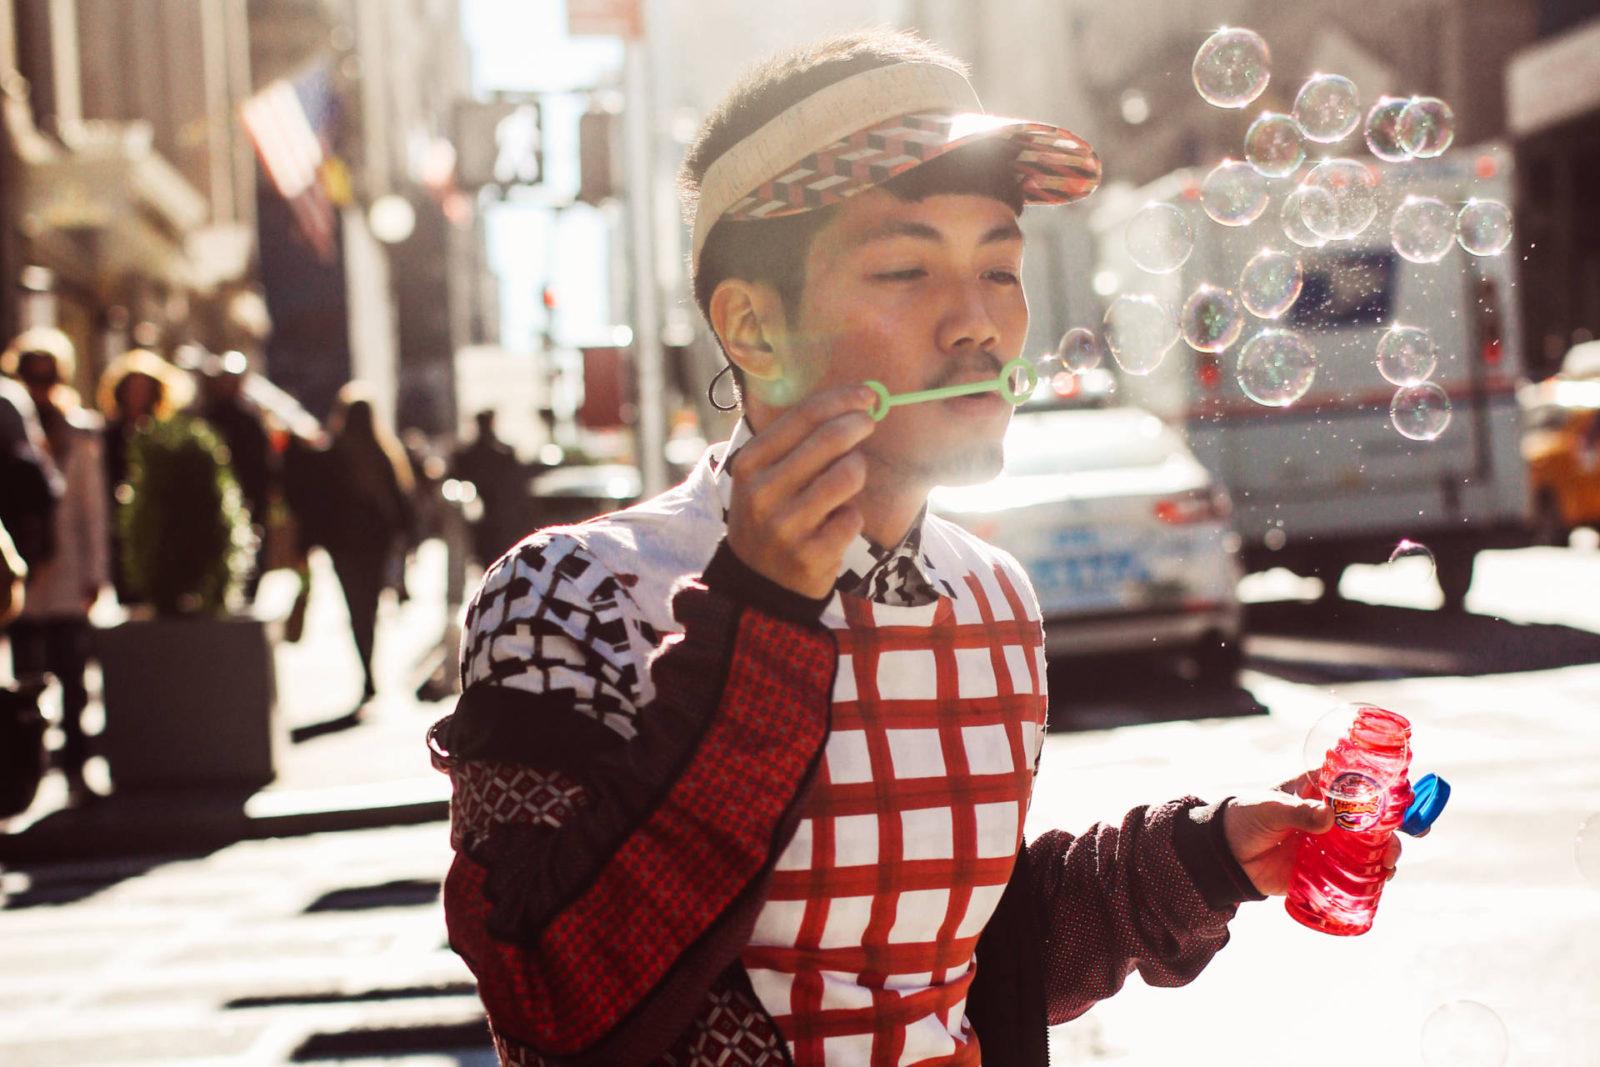 matt-chu-picchu-bubbles-4